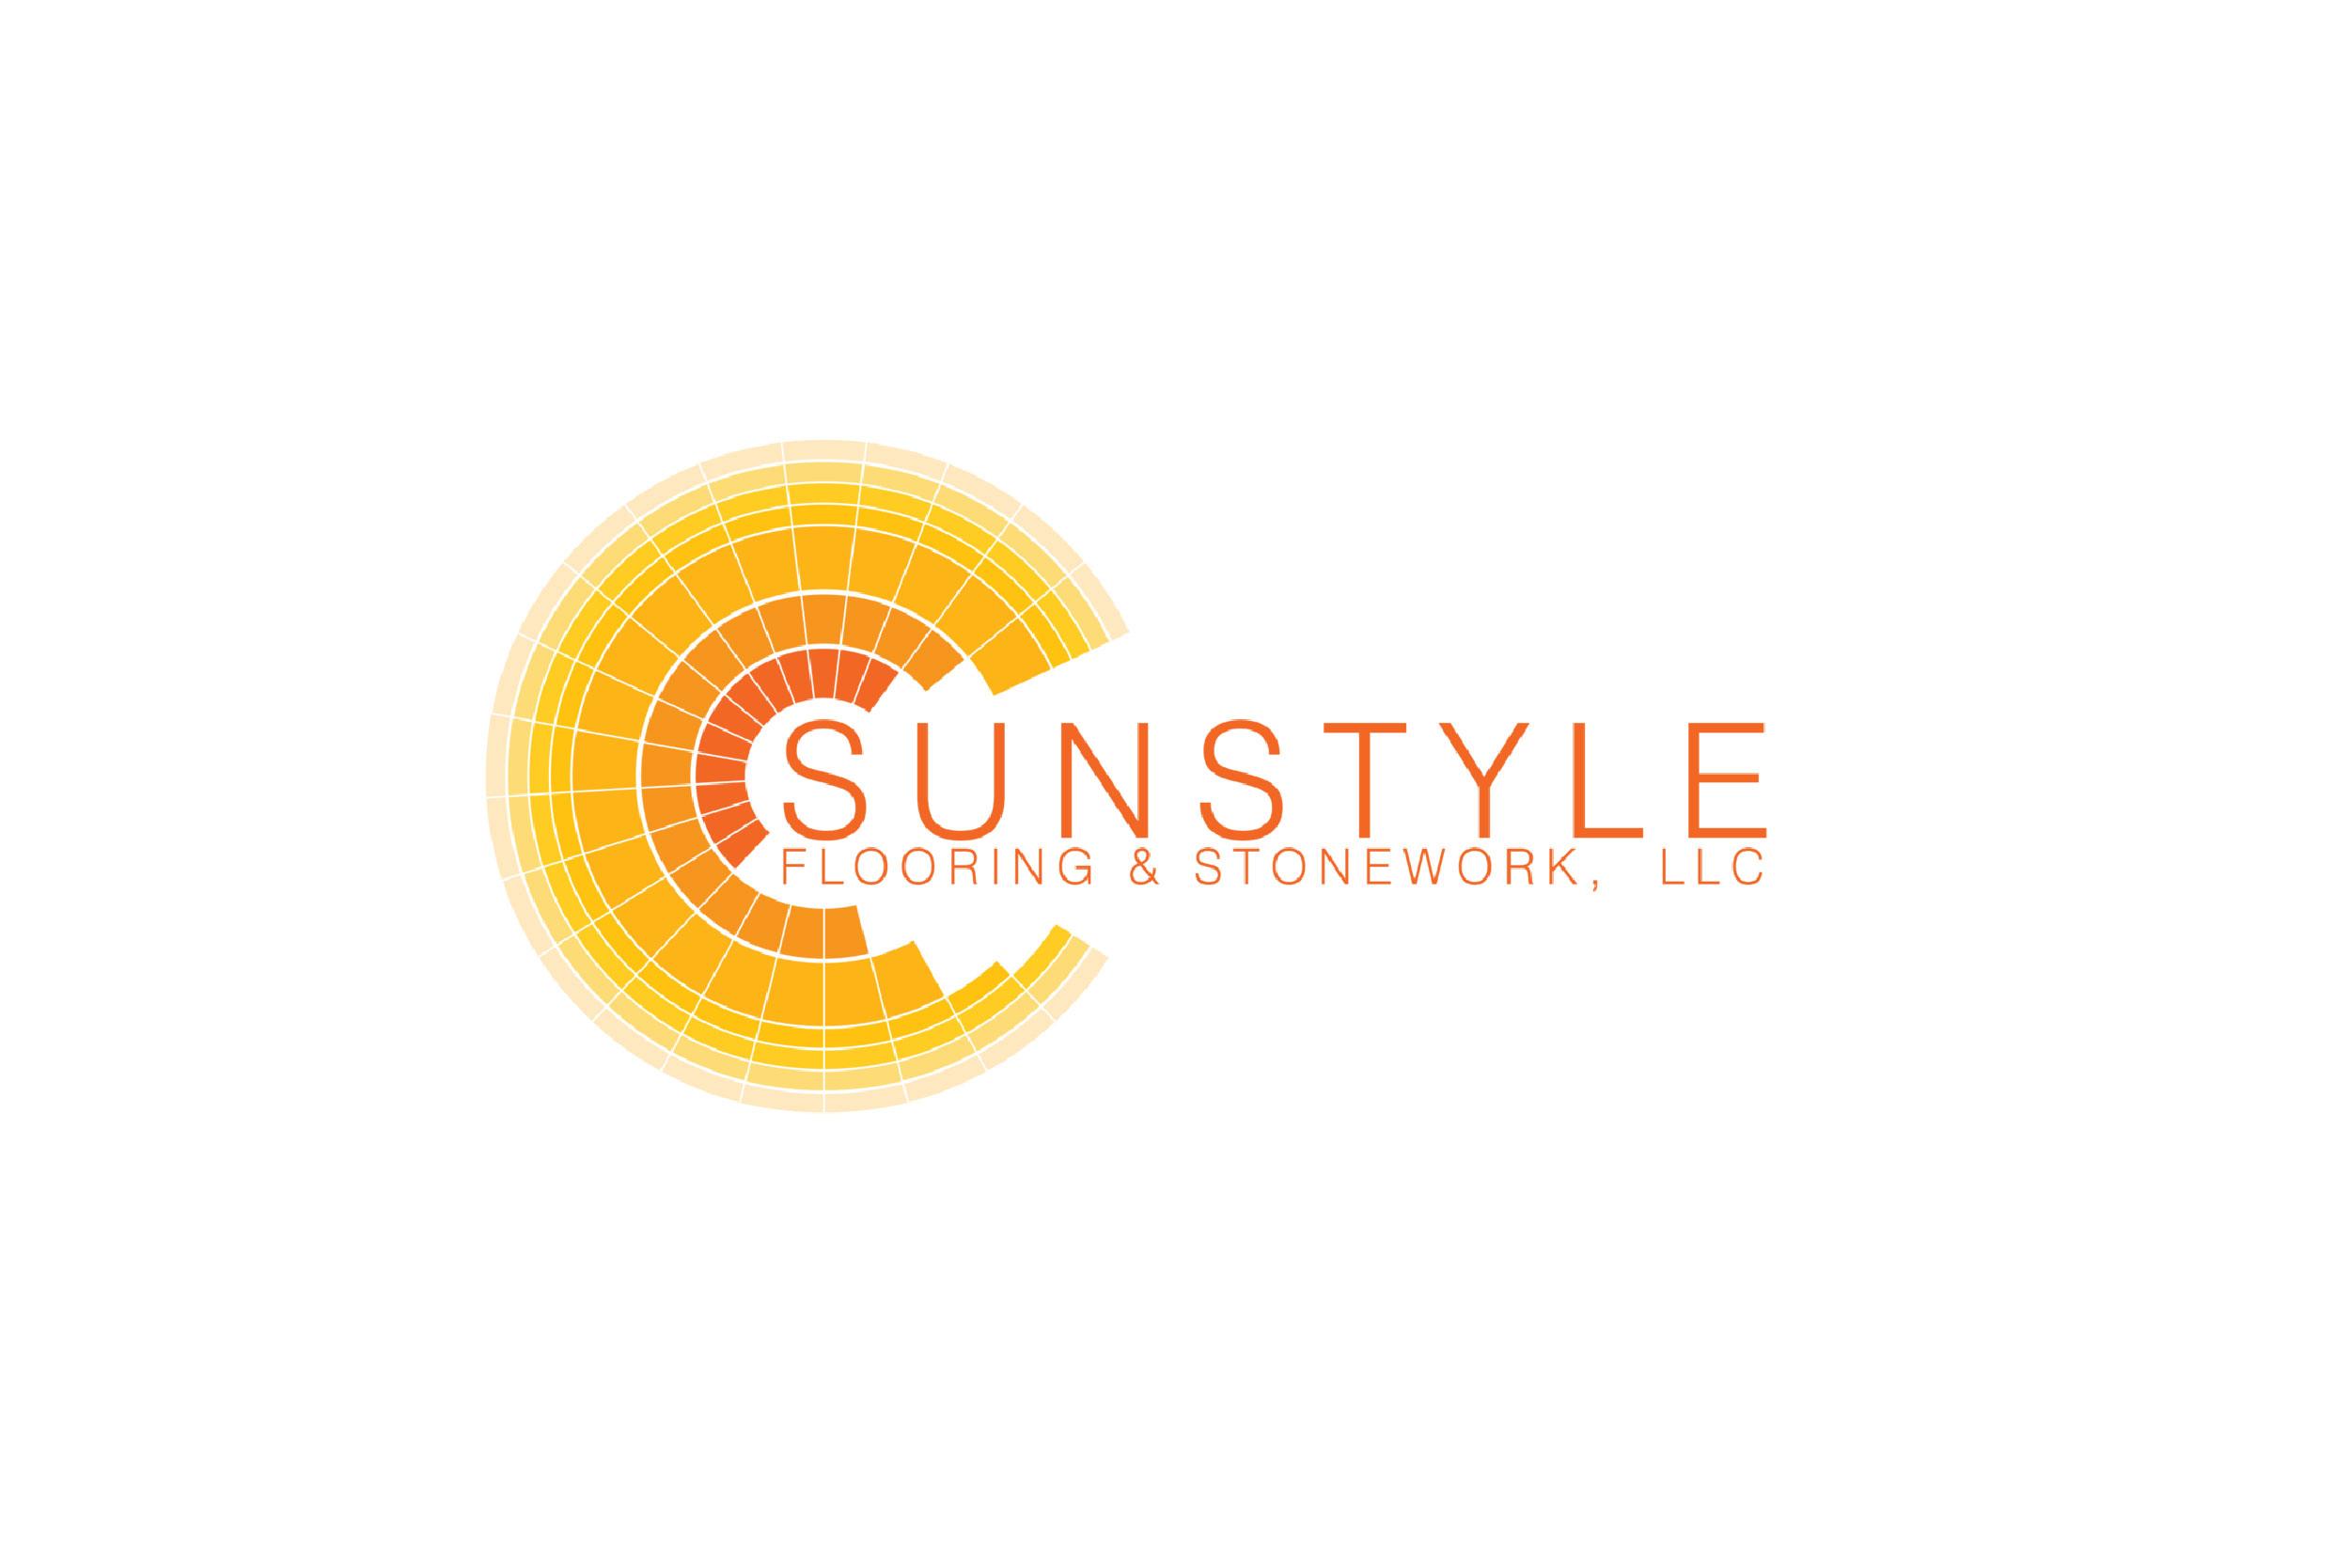 sunstyle-01.jpg